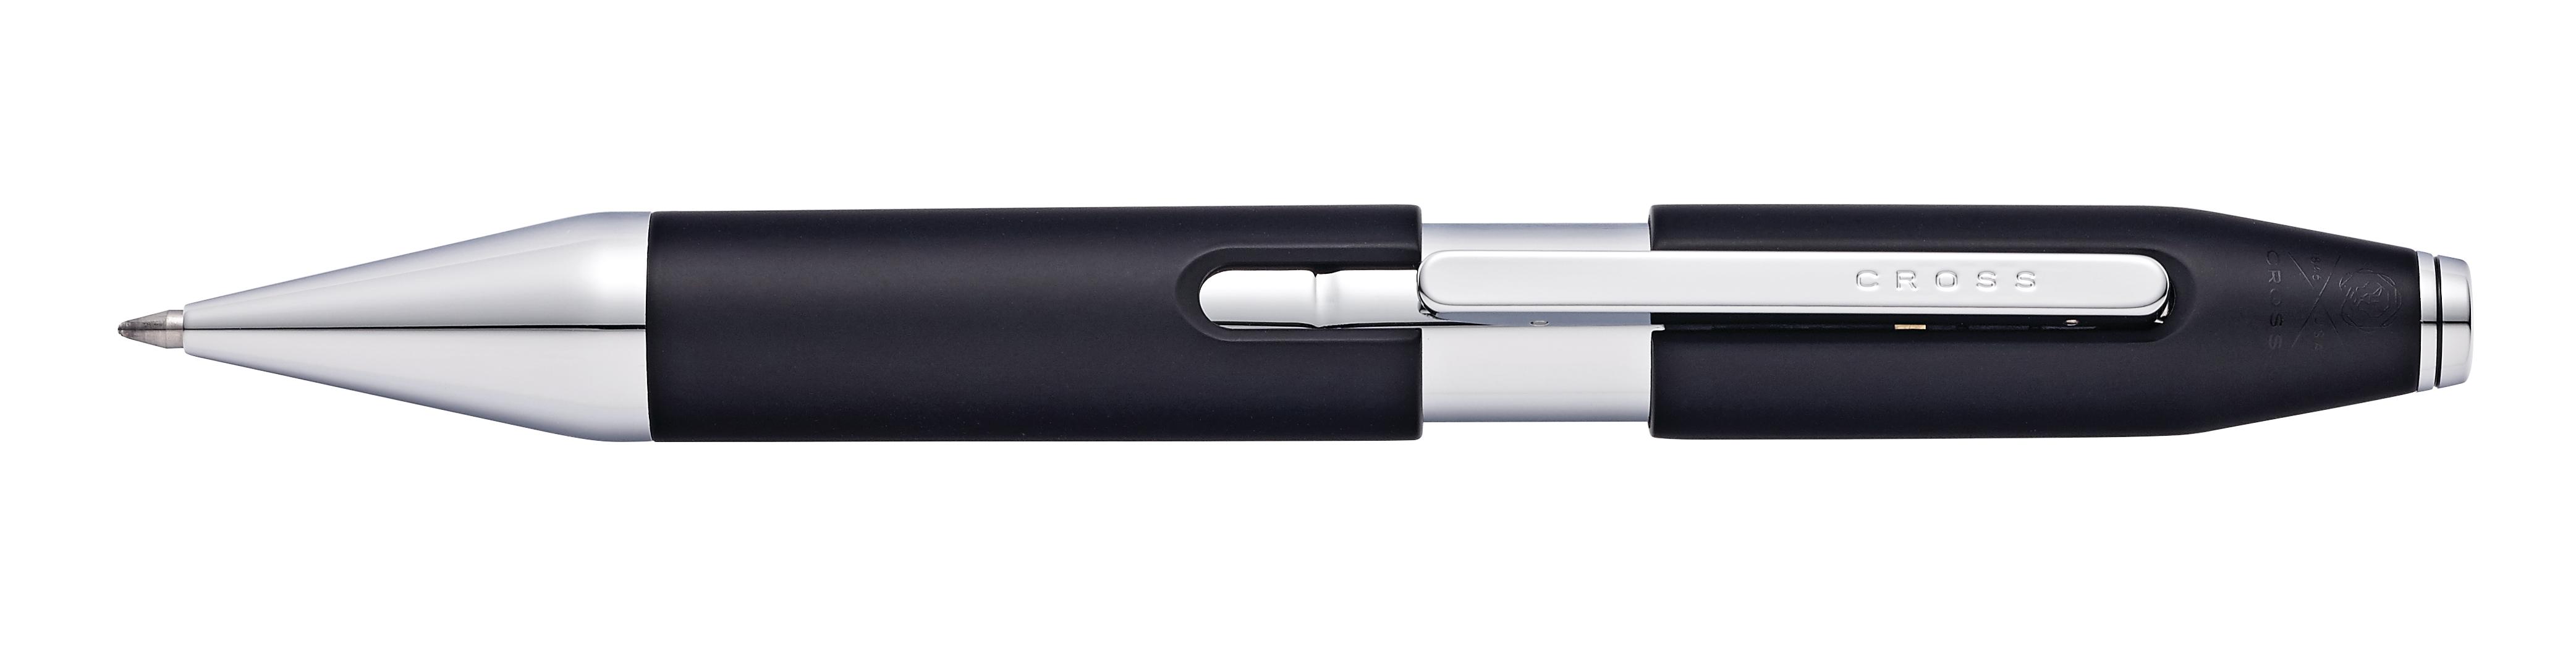 Cross X Charcoal Black Rollerball Pen